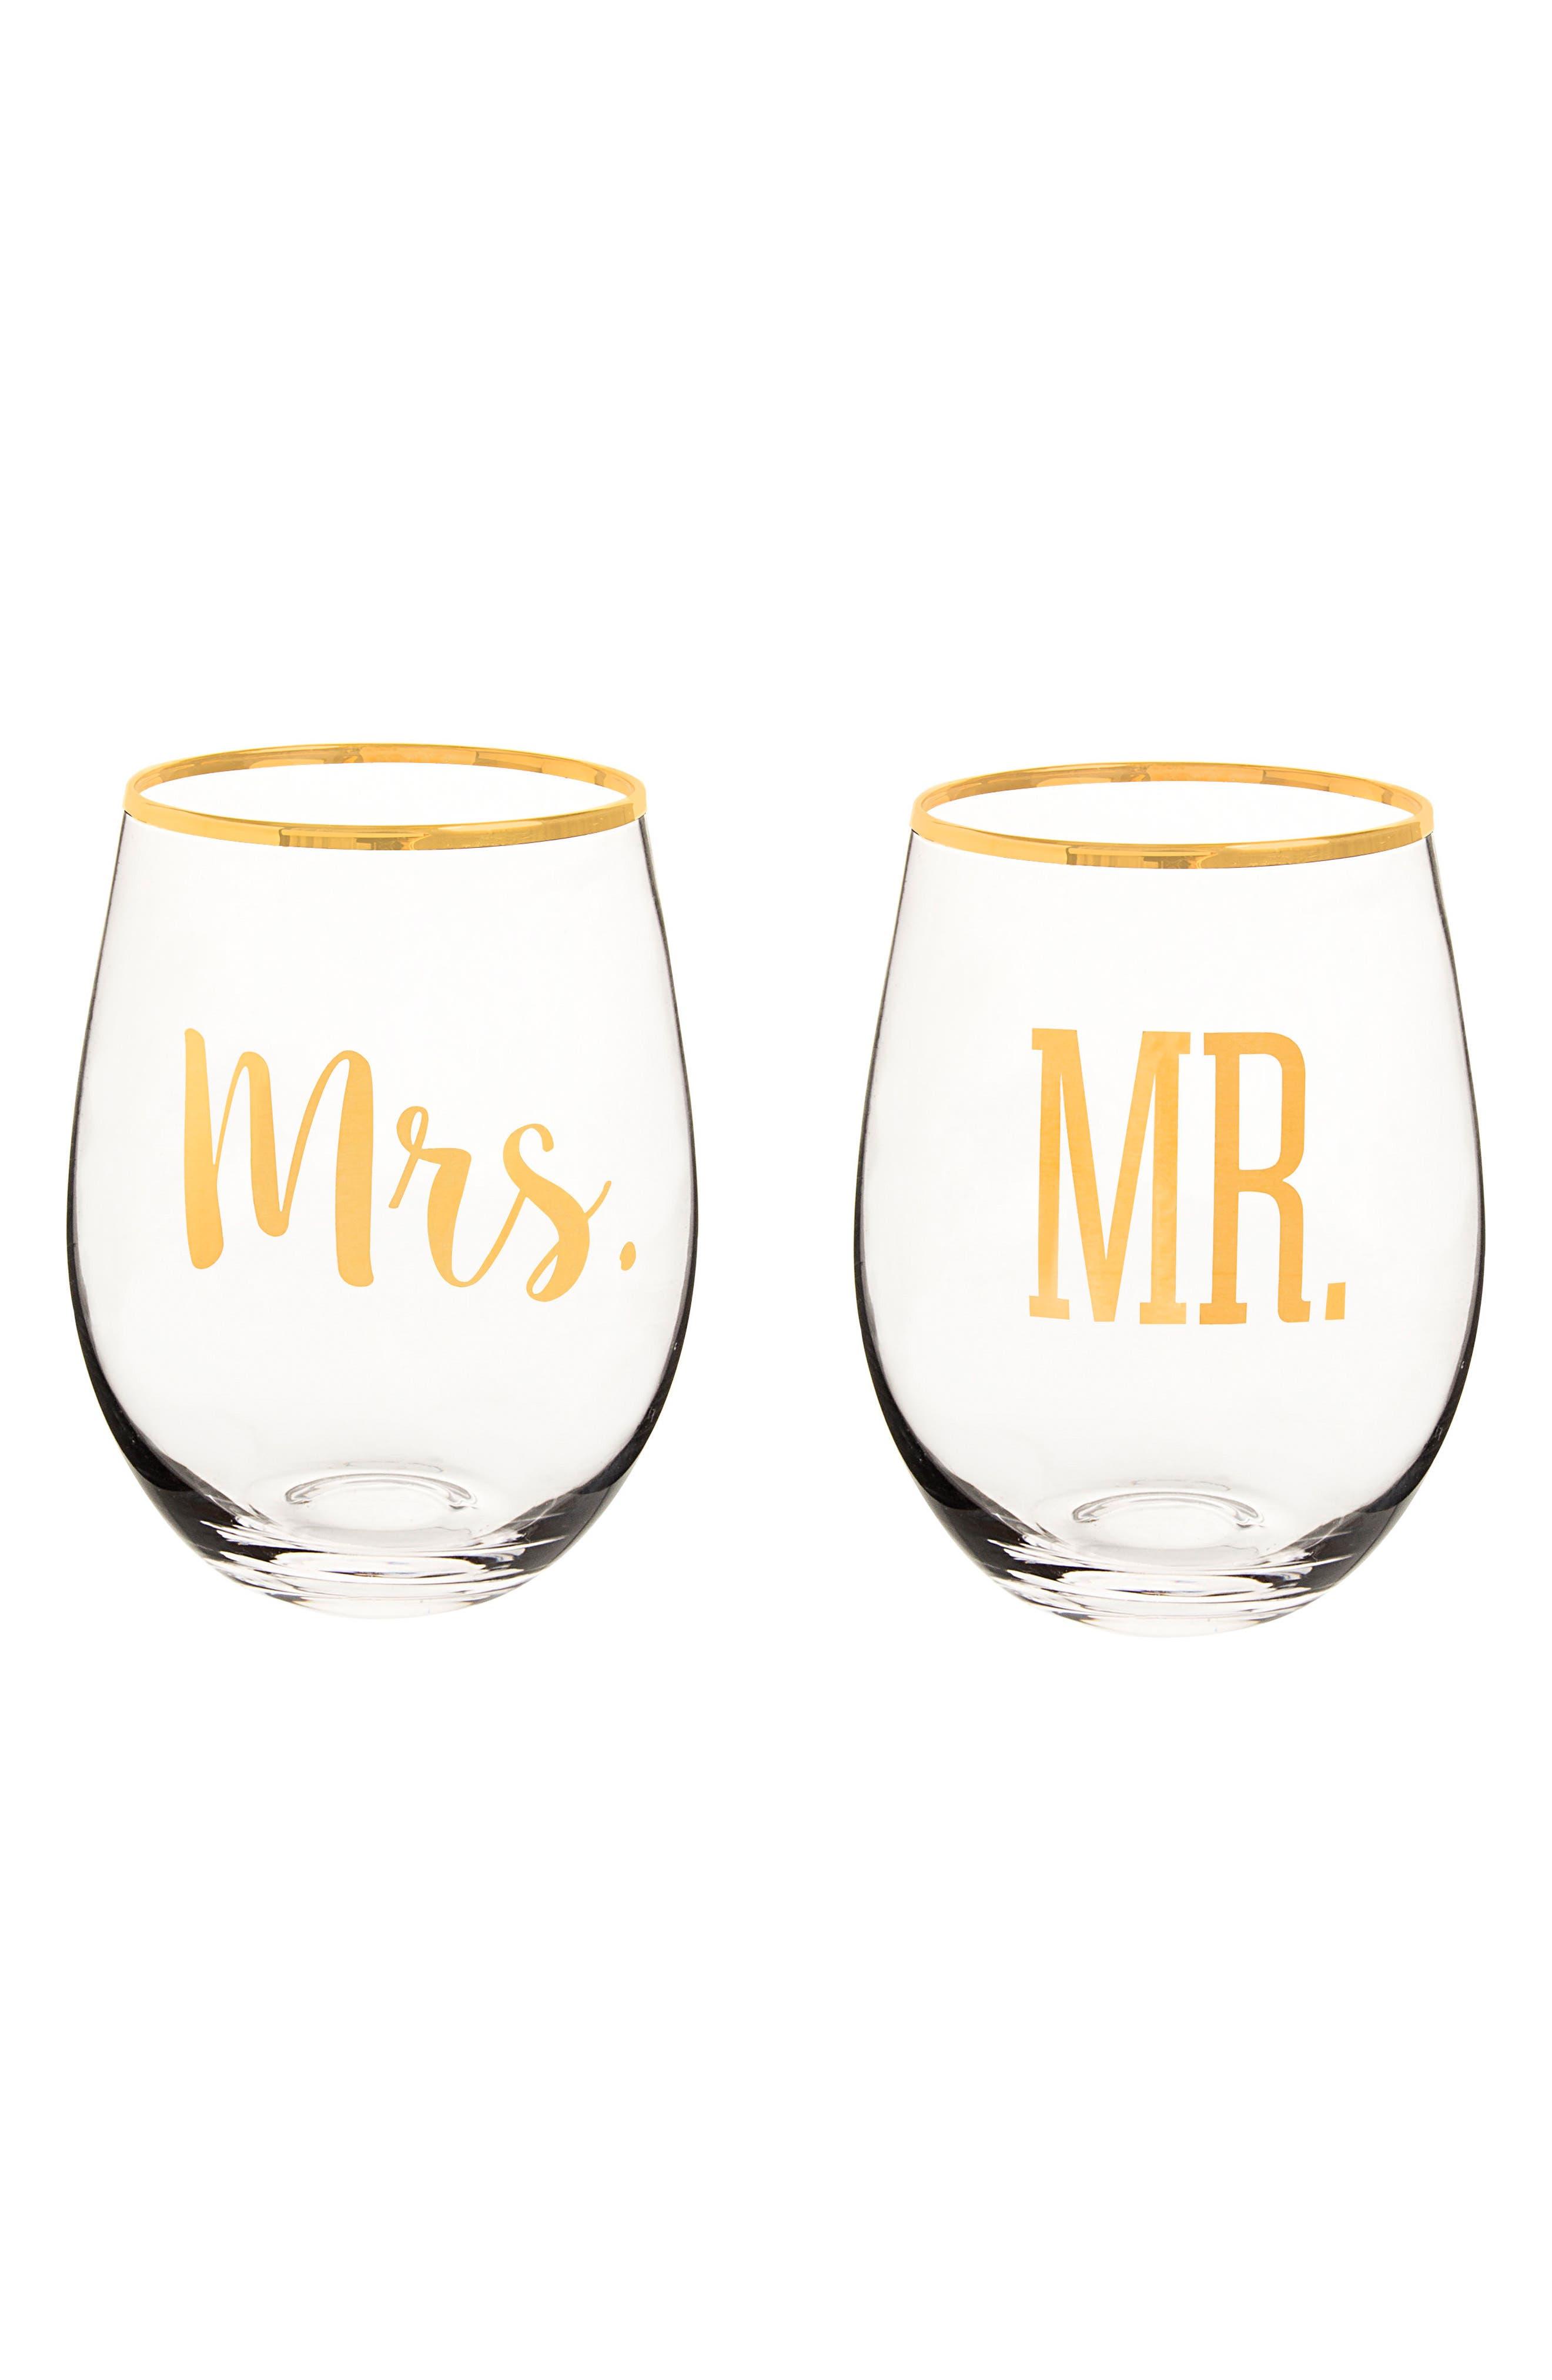 Mr. & Mrs. Set of 2 Stemless Wine Glasses,                             Main thumbnail 1, color,                             710